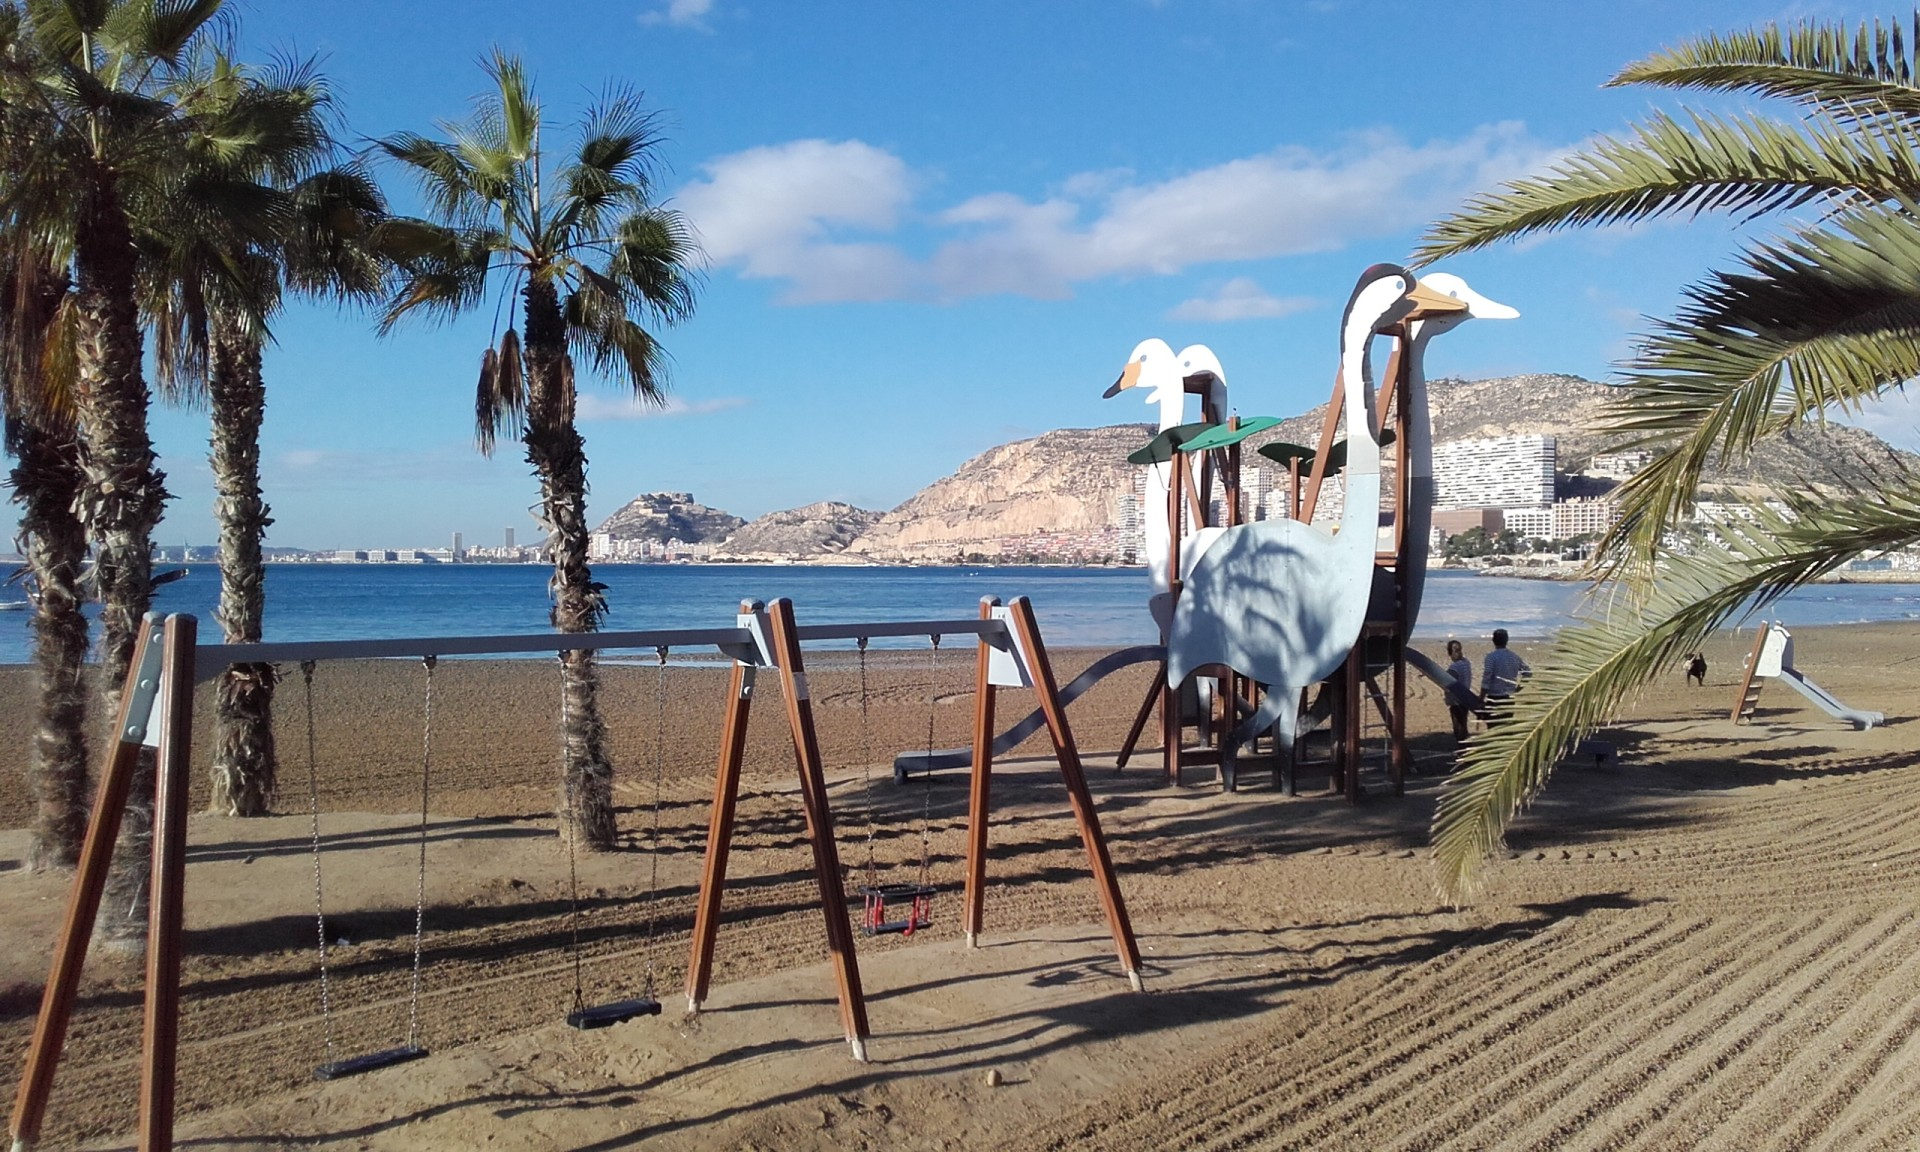 Alicante nosaltres4 familias en ruta for Hoteles familiares alicante